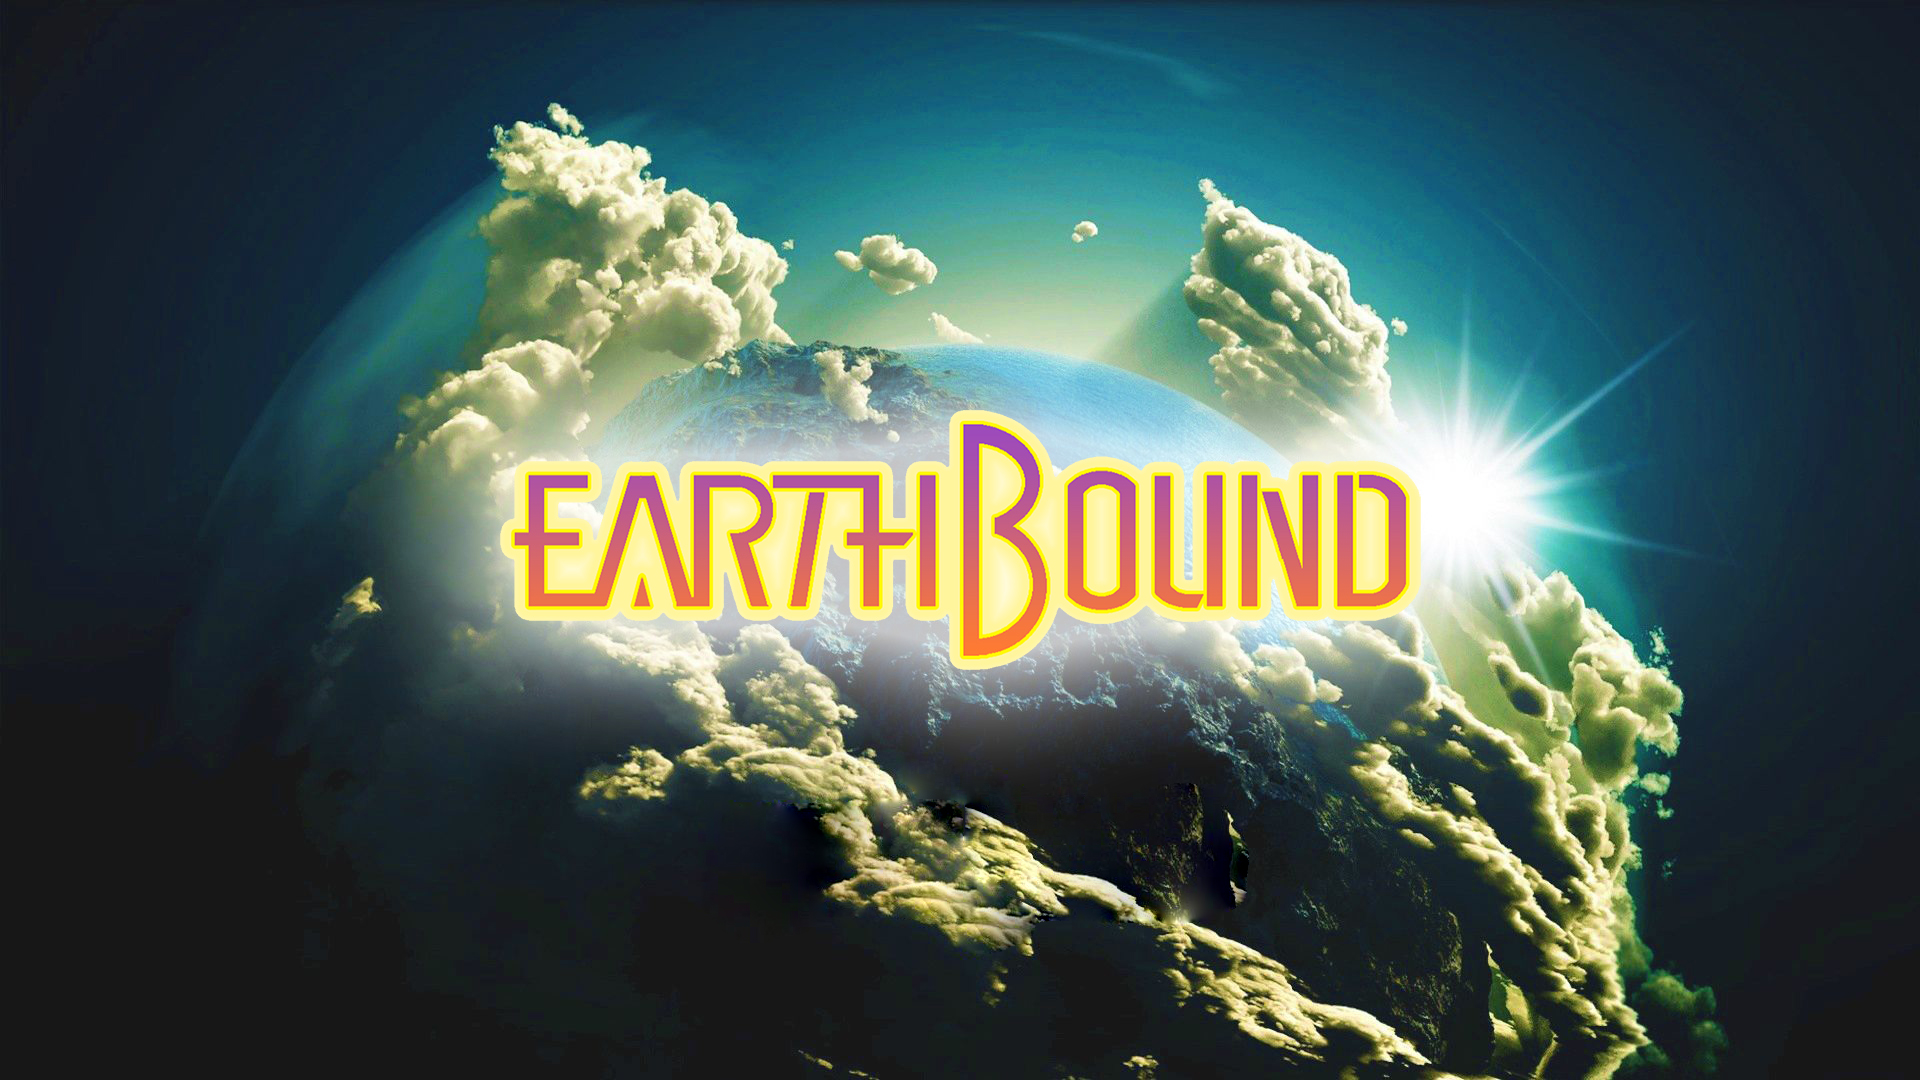 Love Quotes Wallpaper Download Free Earthbound Backgrounds Pixelstalk Net